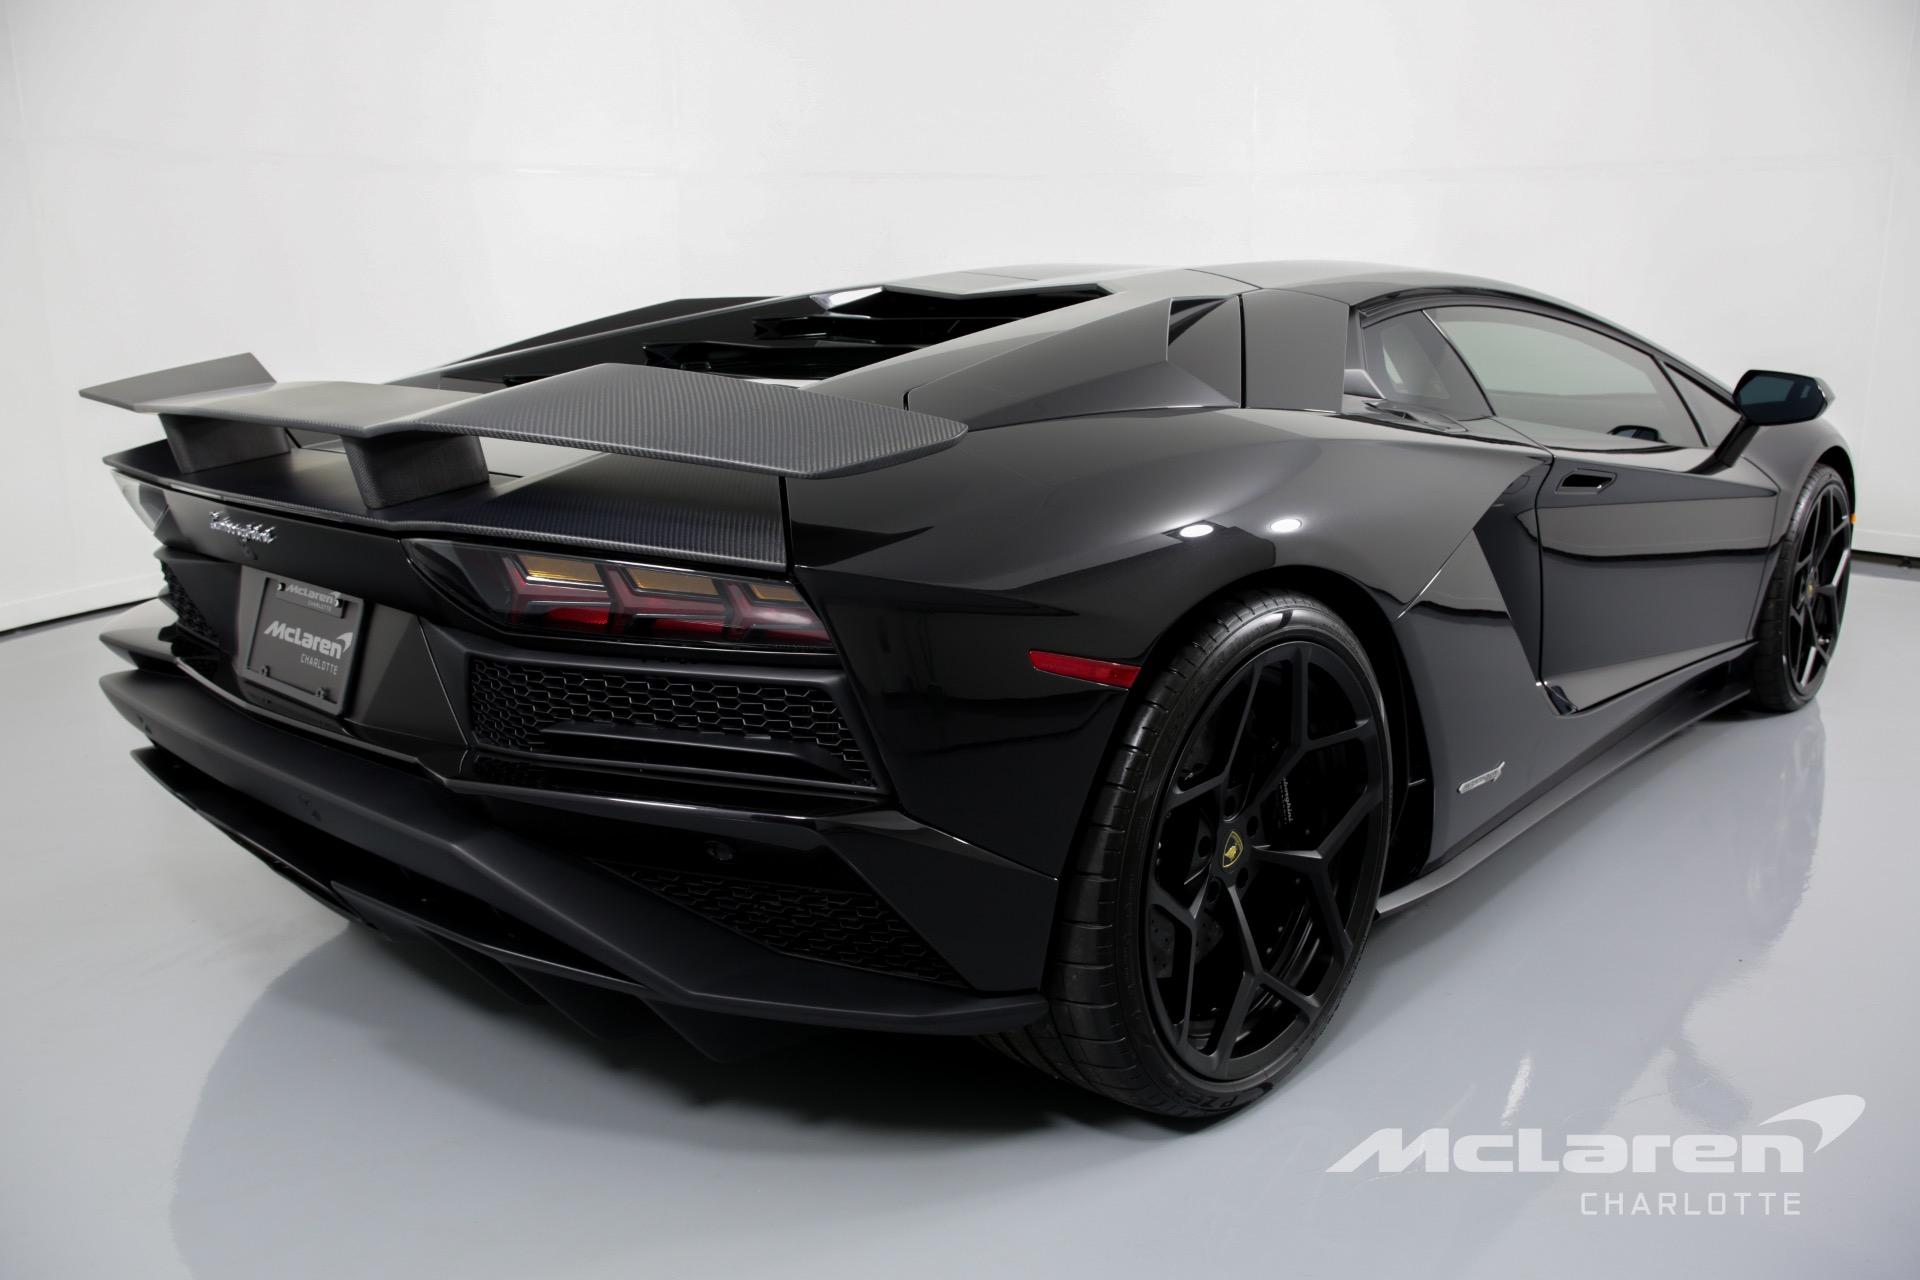 Used 2018 Lamborghini Aventador Lp 740 4 S For Sale 389 996